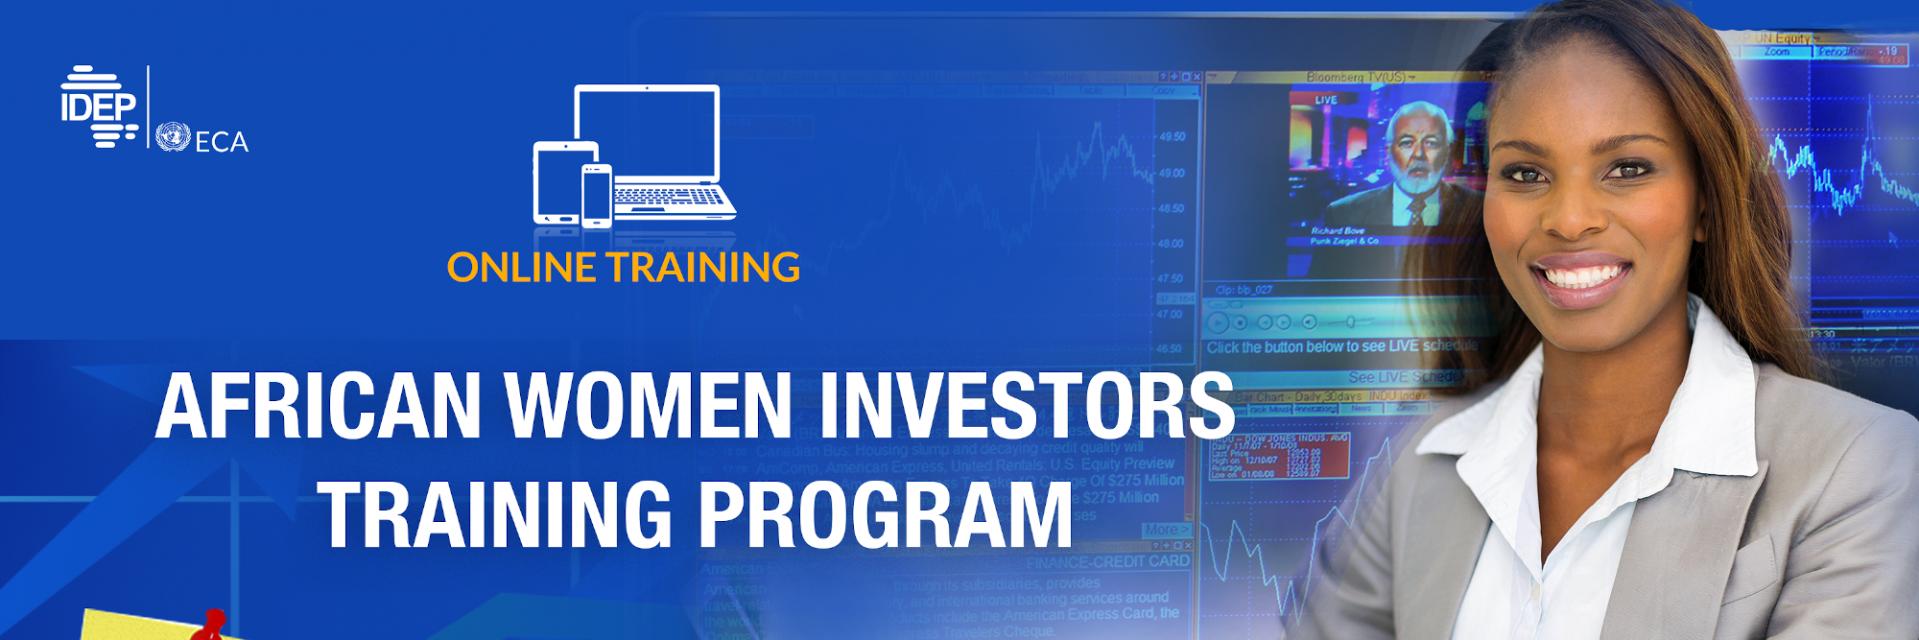 African Women Investors Training Program